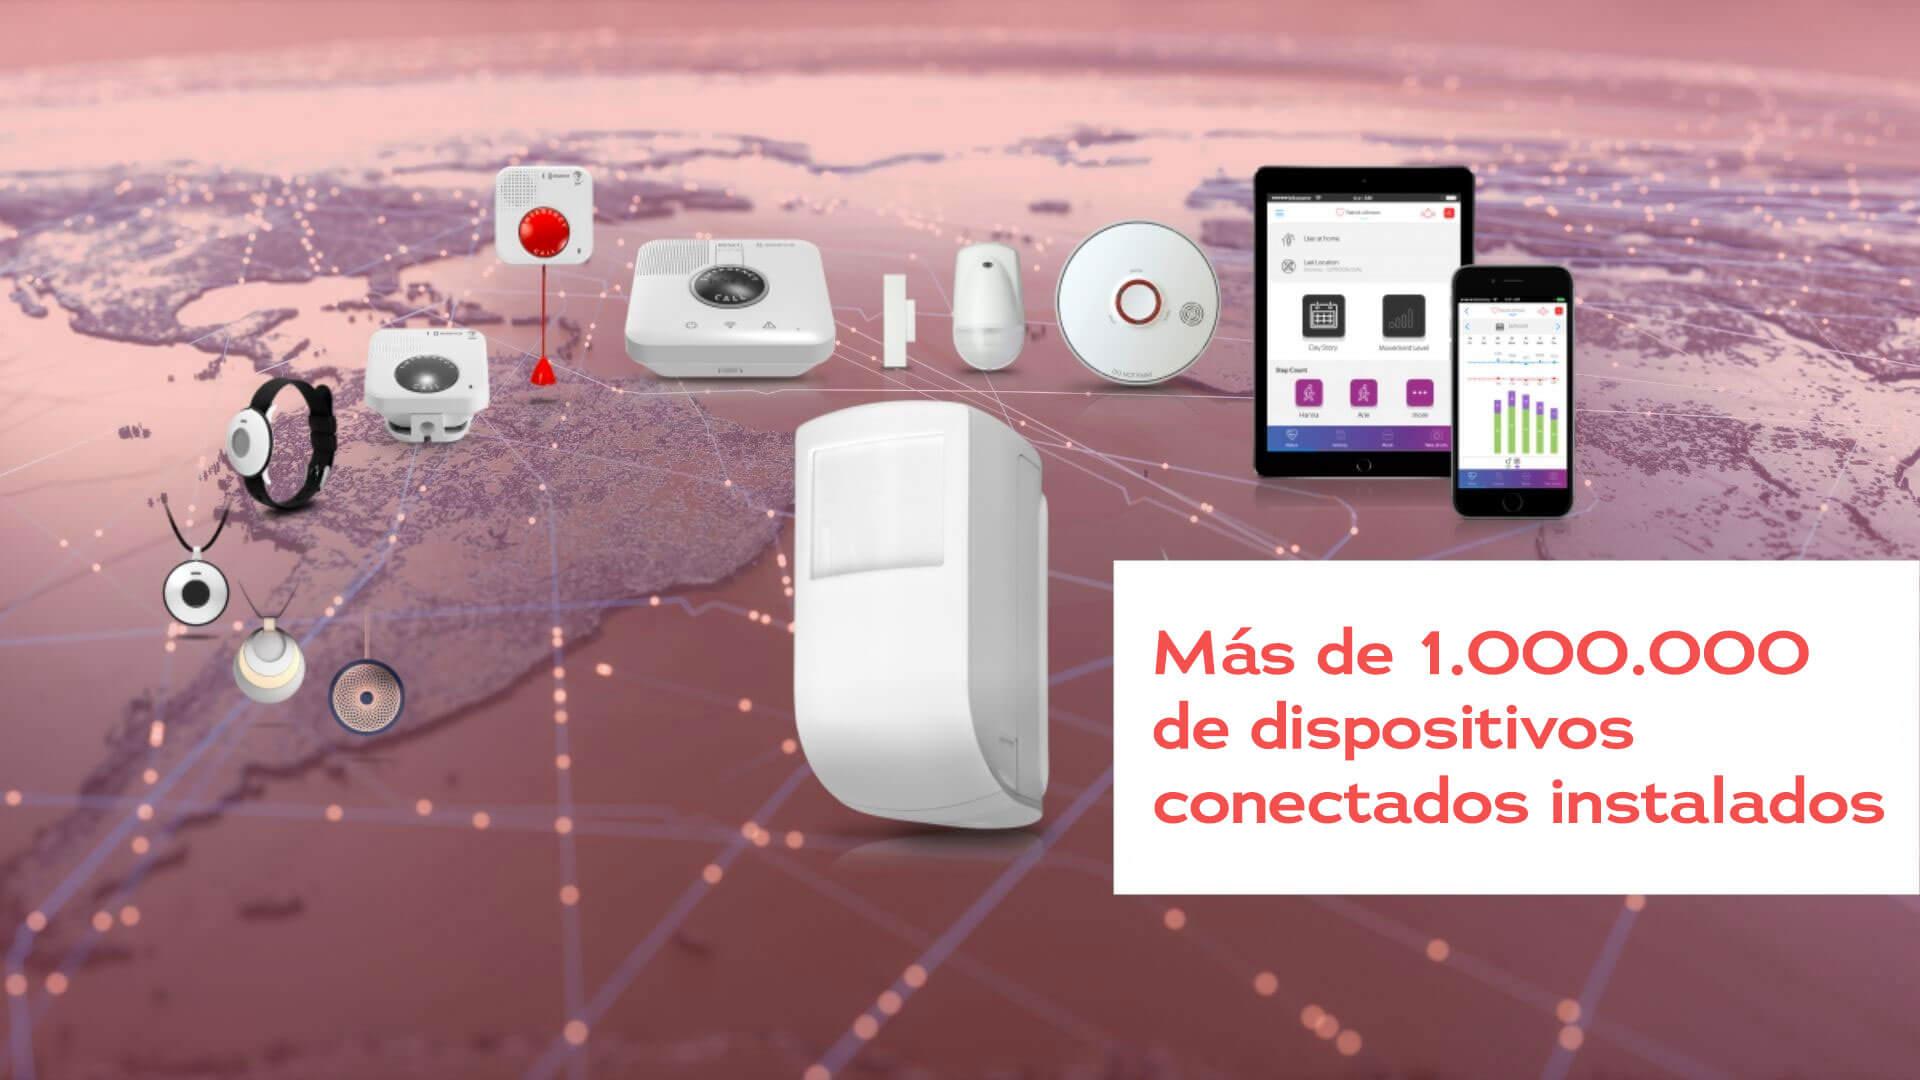 Essence Smartcare teleasistencia avanzada